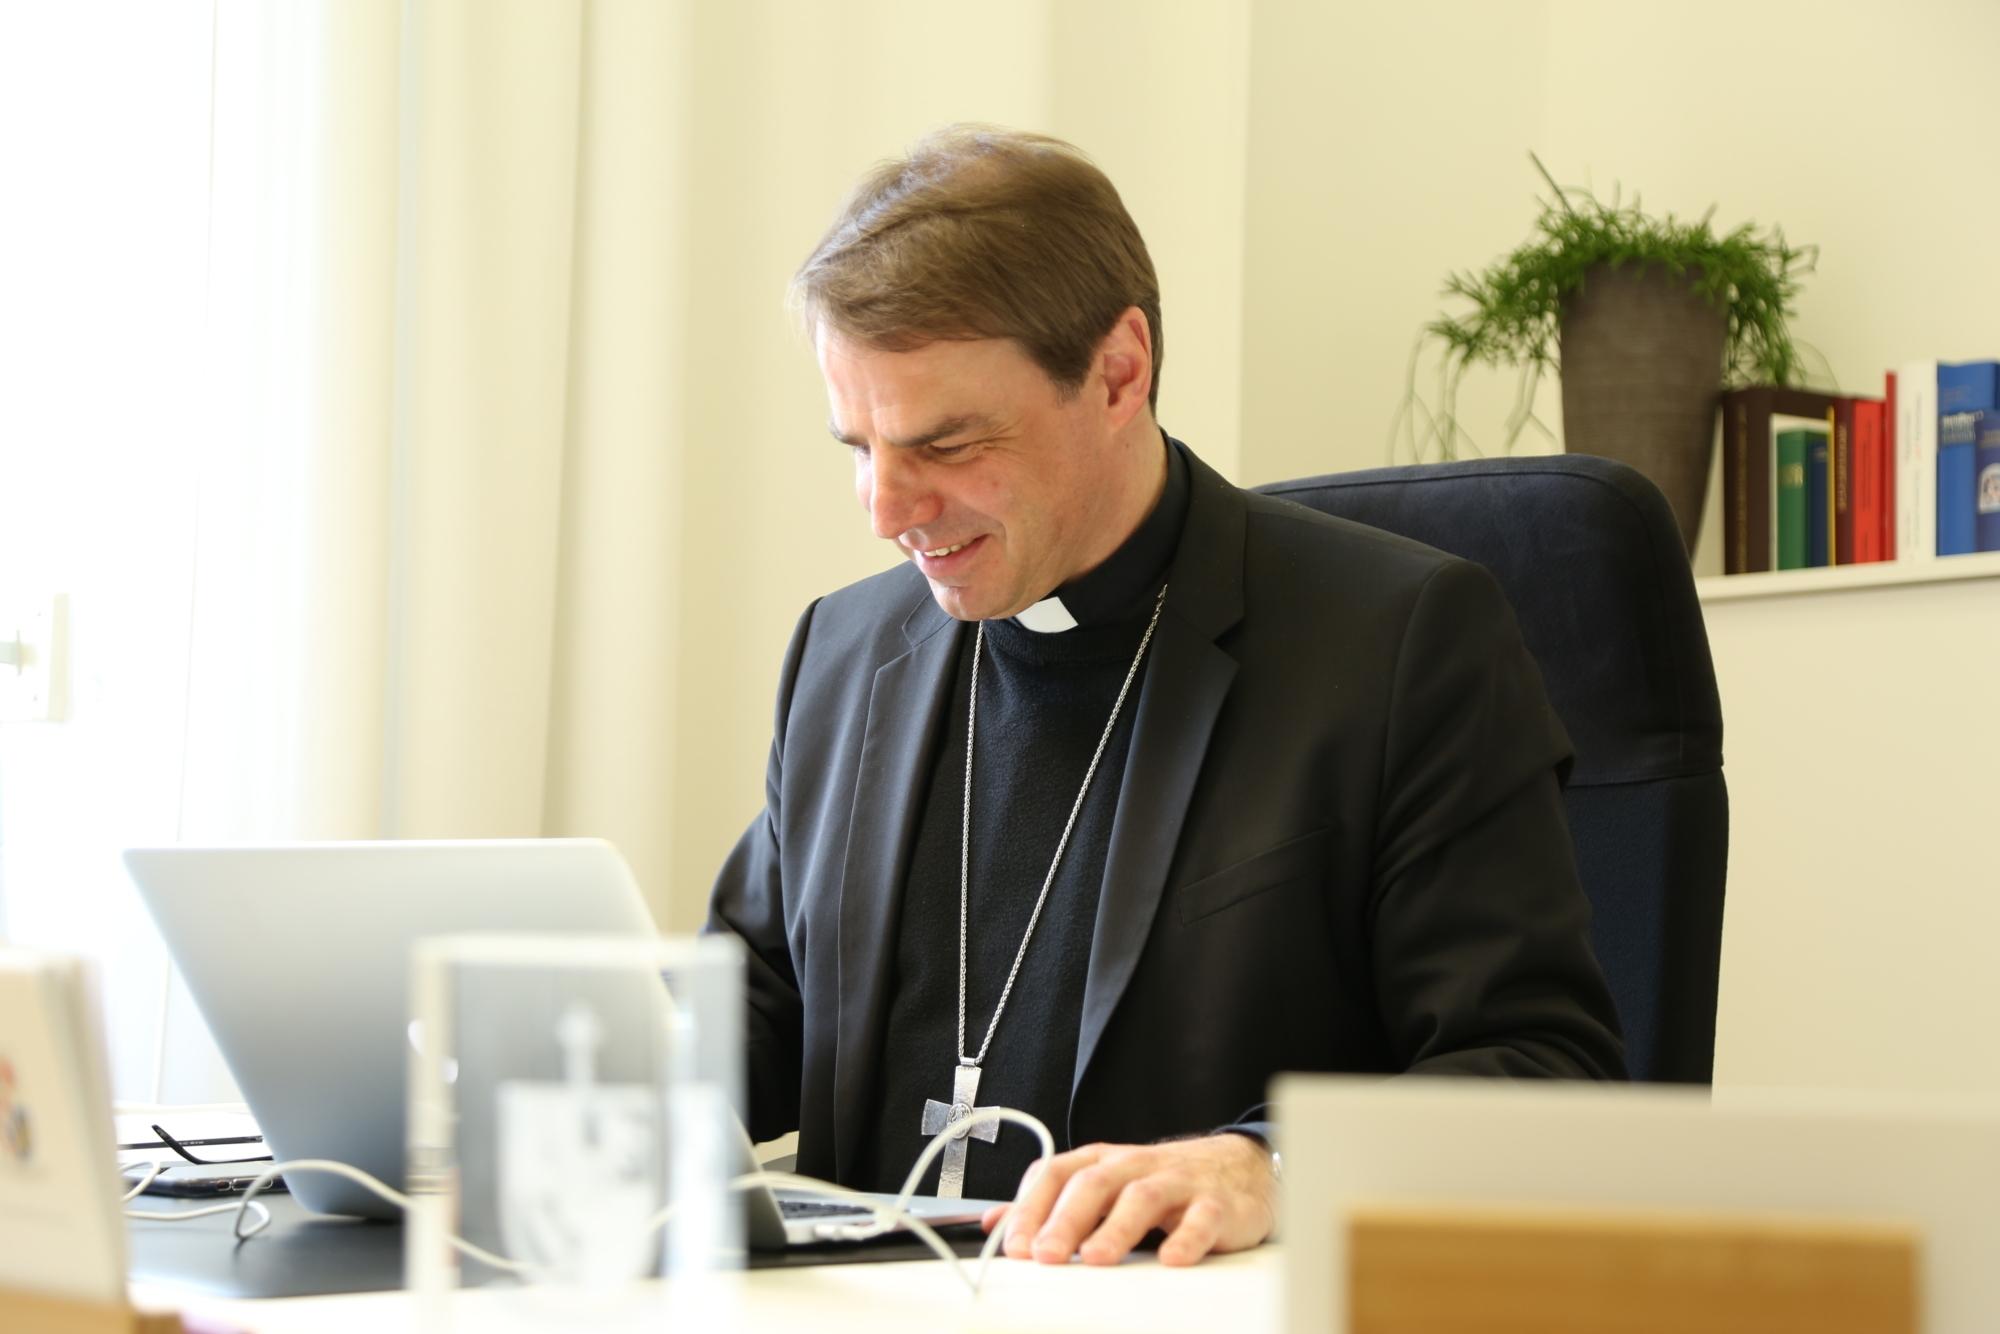 Bischof Stefan Oster Medien Presse Social Media 2021